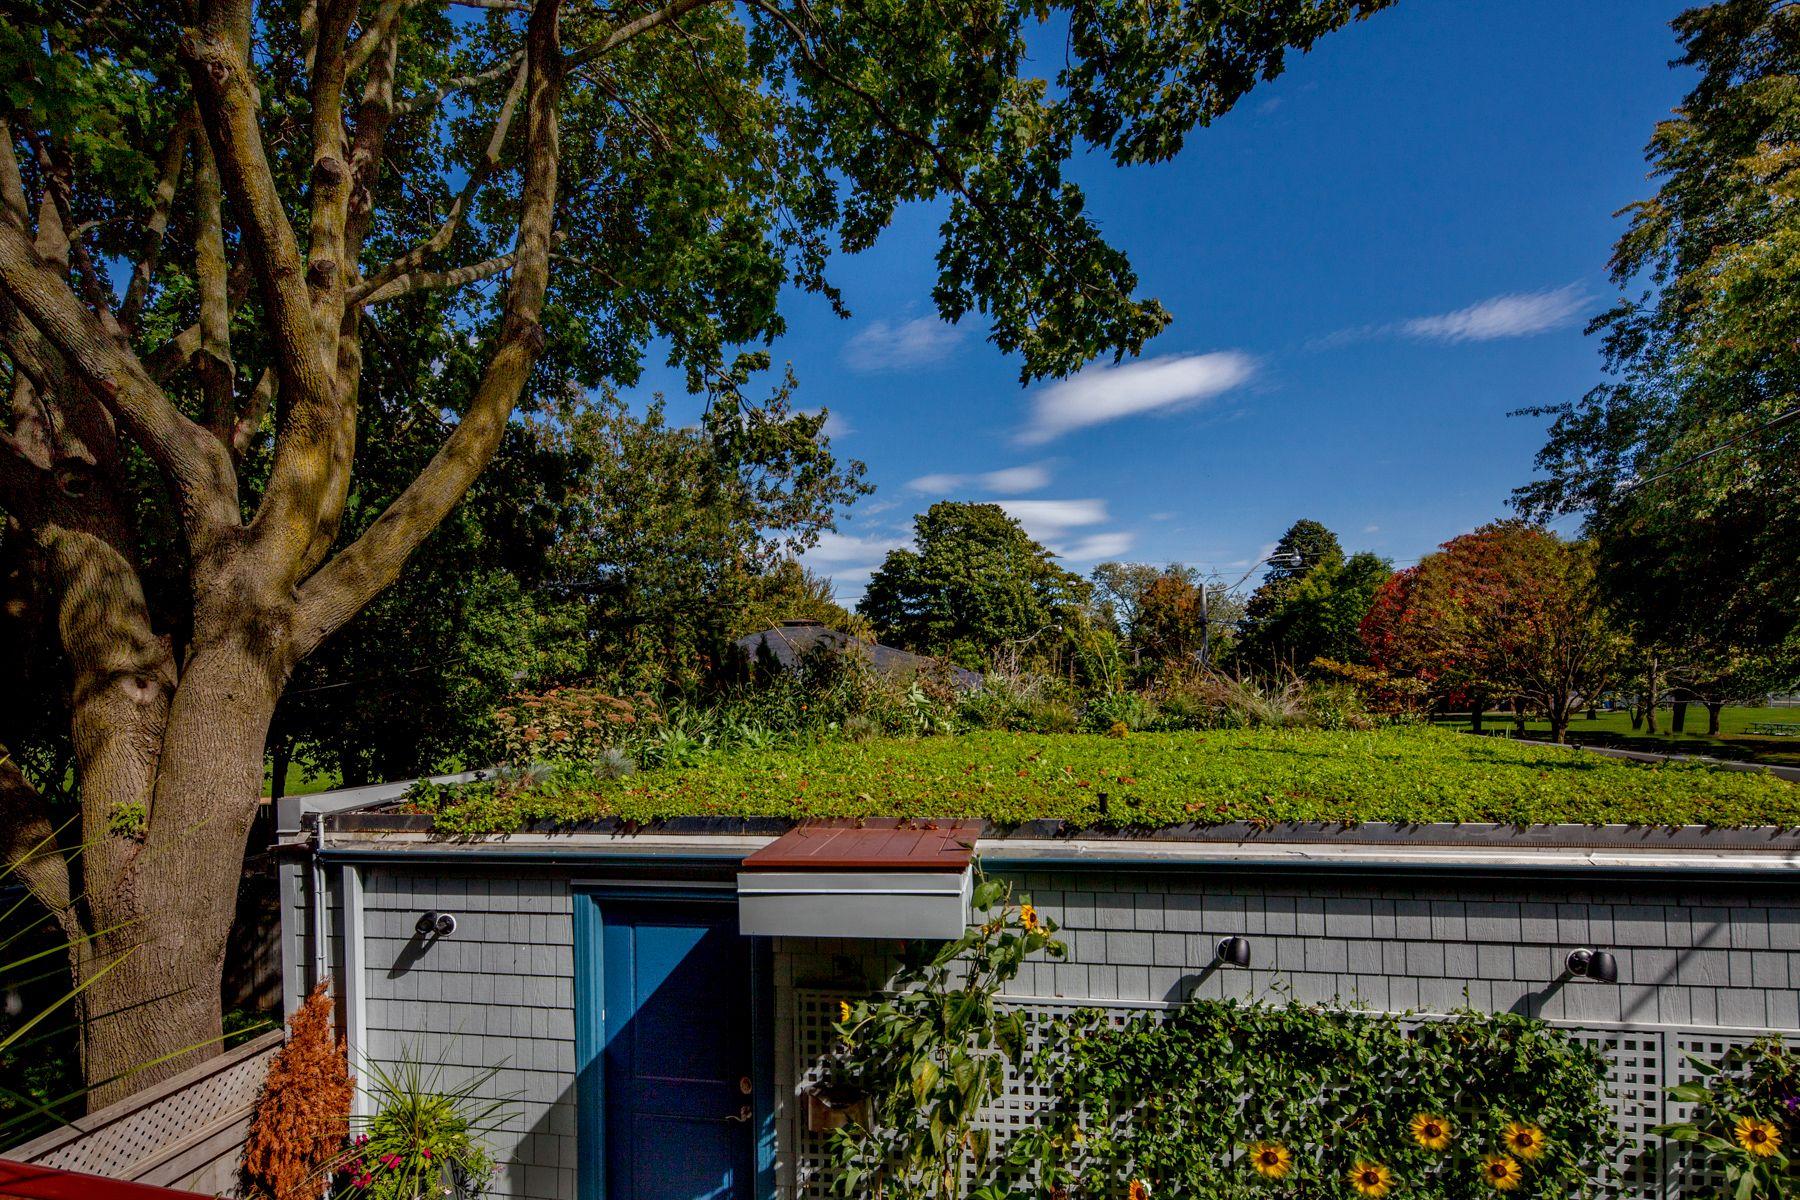 kewbeachouse green roof